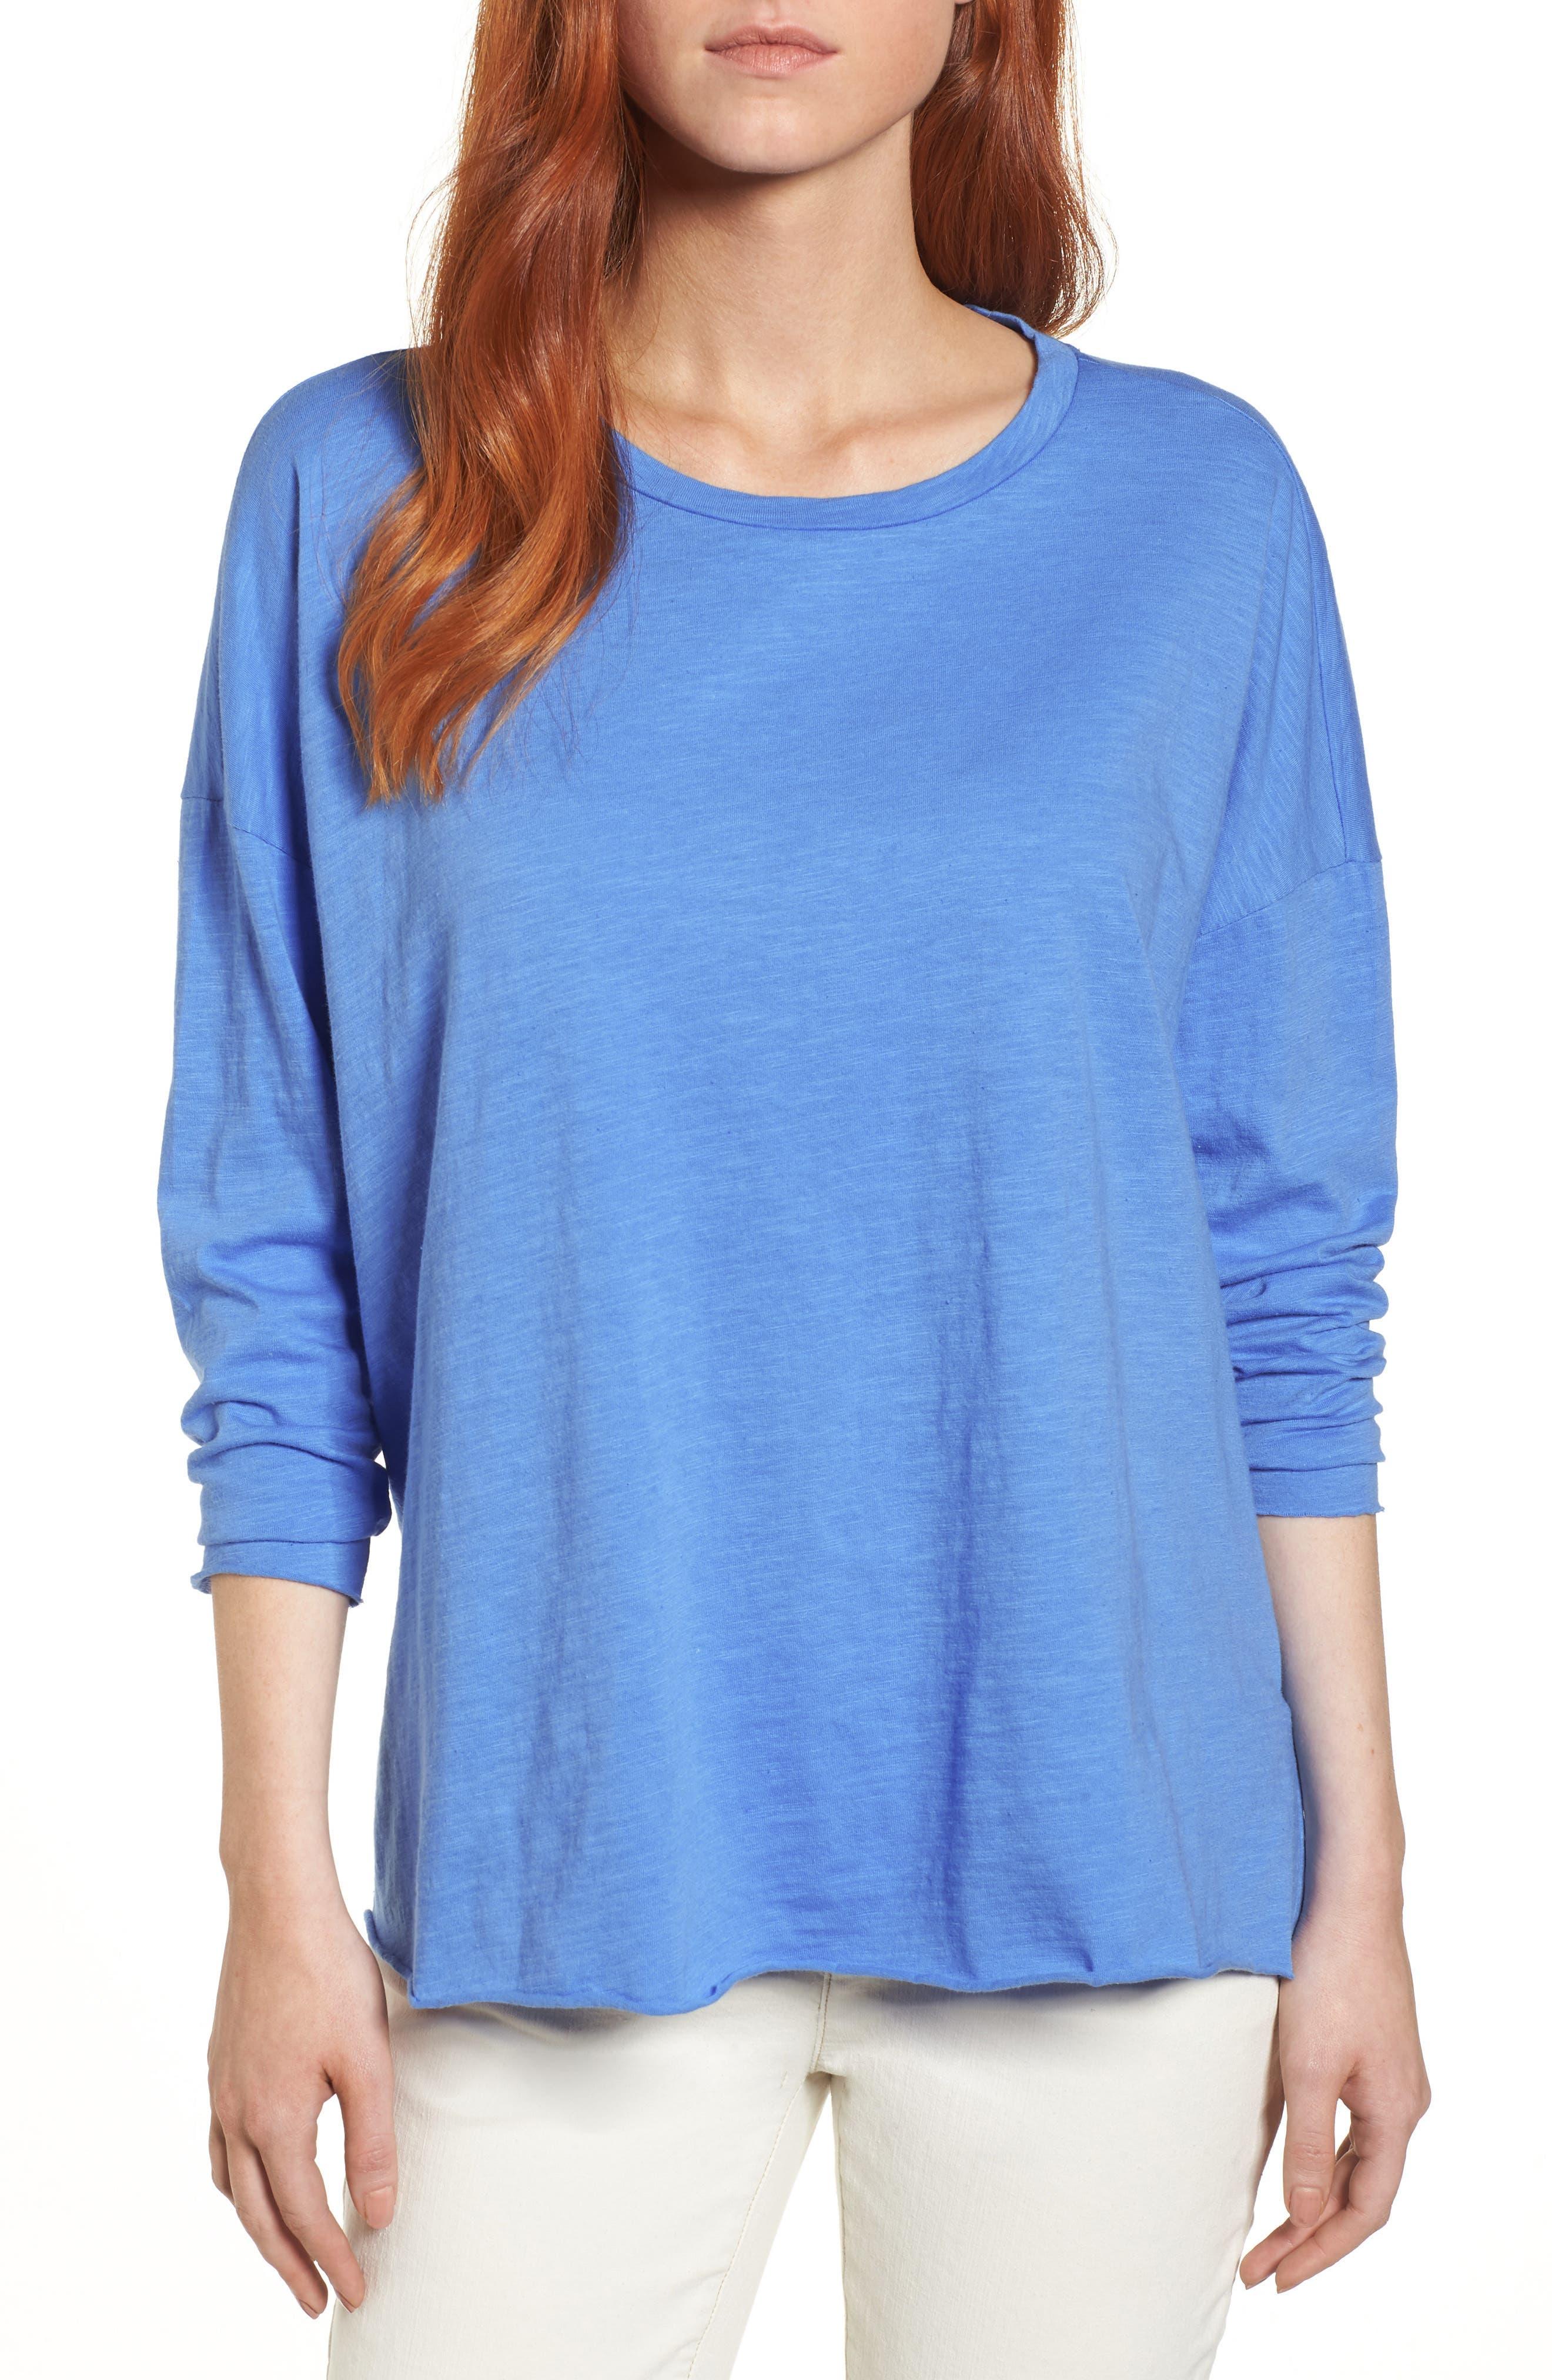 Organic Cotton Knit Top,                             Main thumbnail 1, color,                             Blue Bell